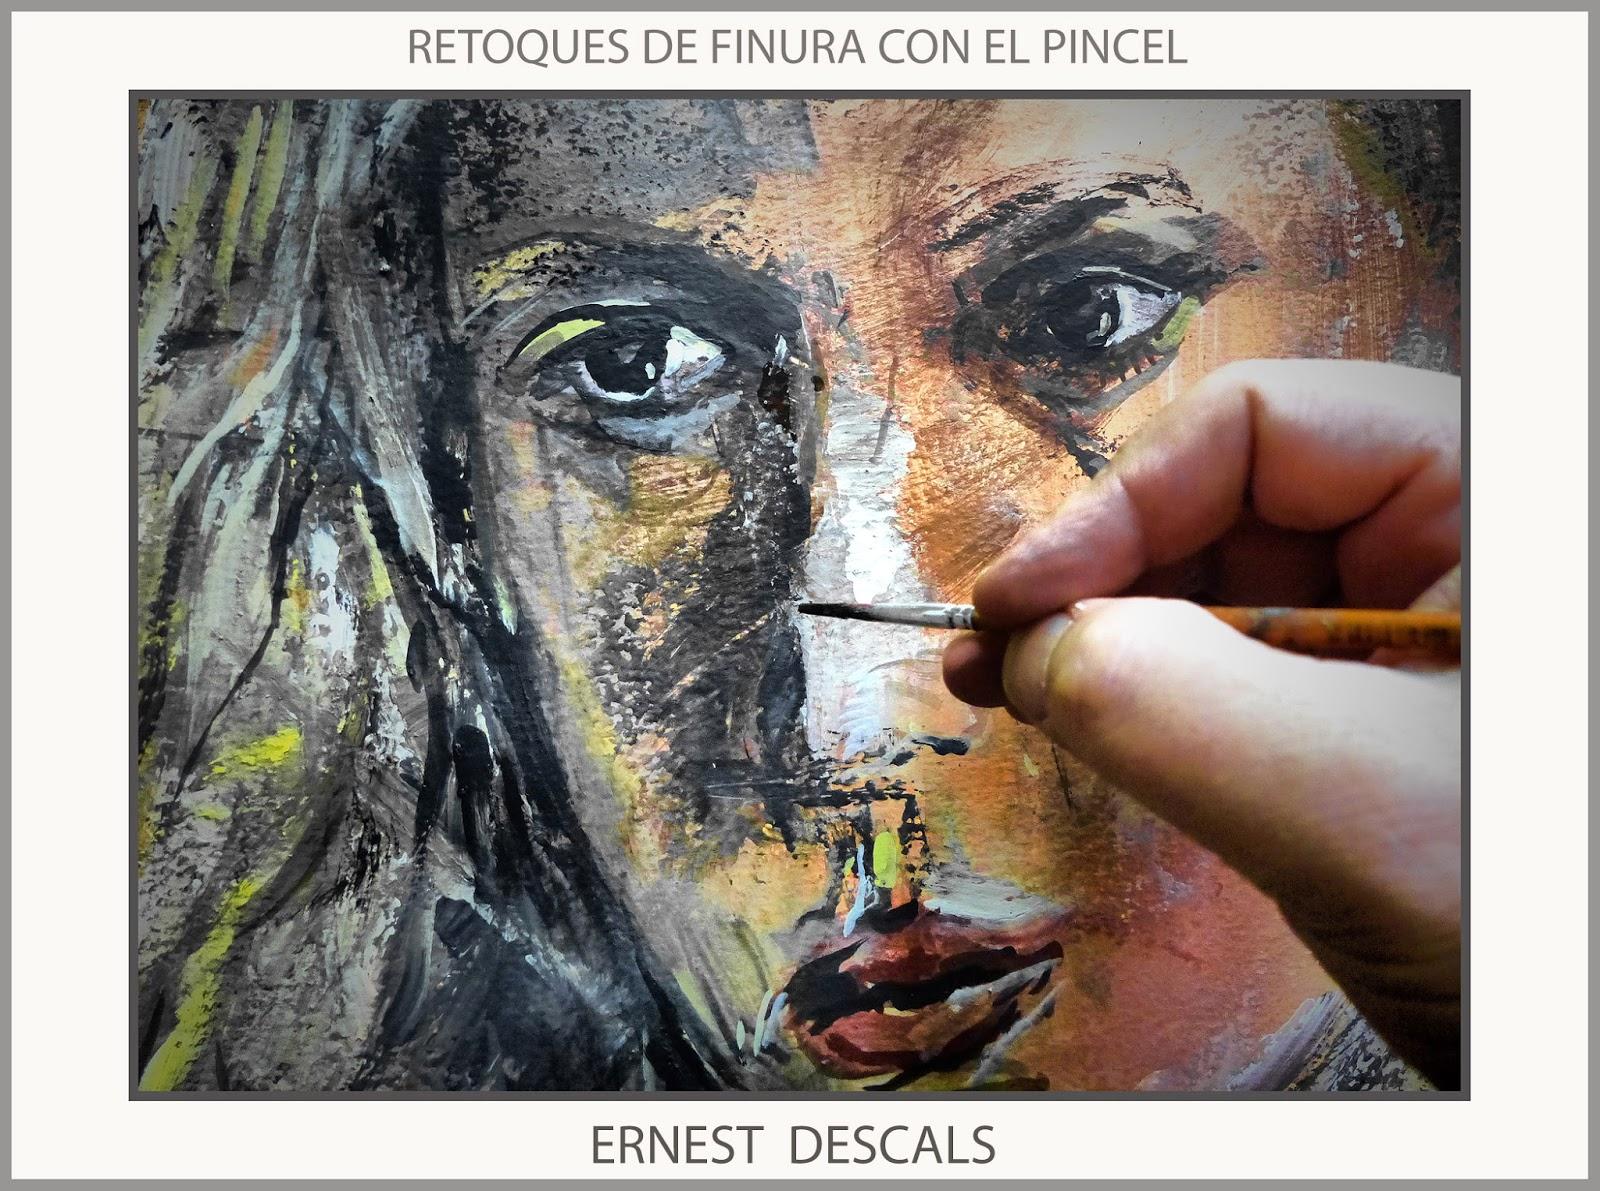 pincel pintando. pintura-mujeres-pinturas-expresividad-mujer-pincel-retoques-pintar- pincel pintando